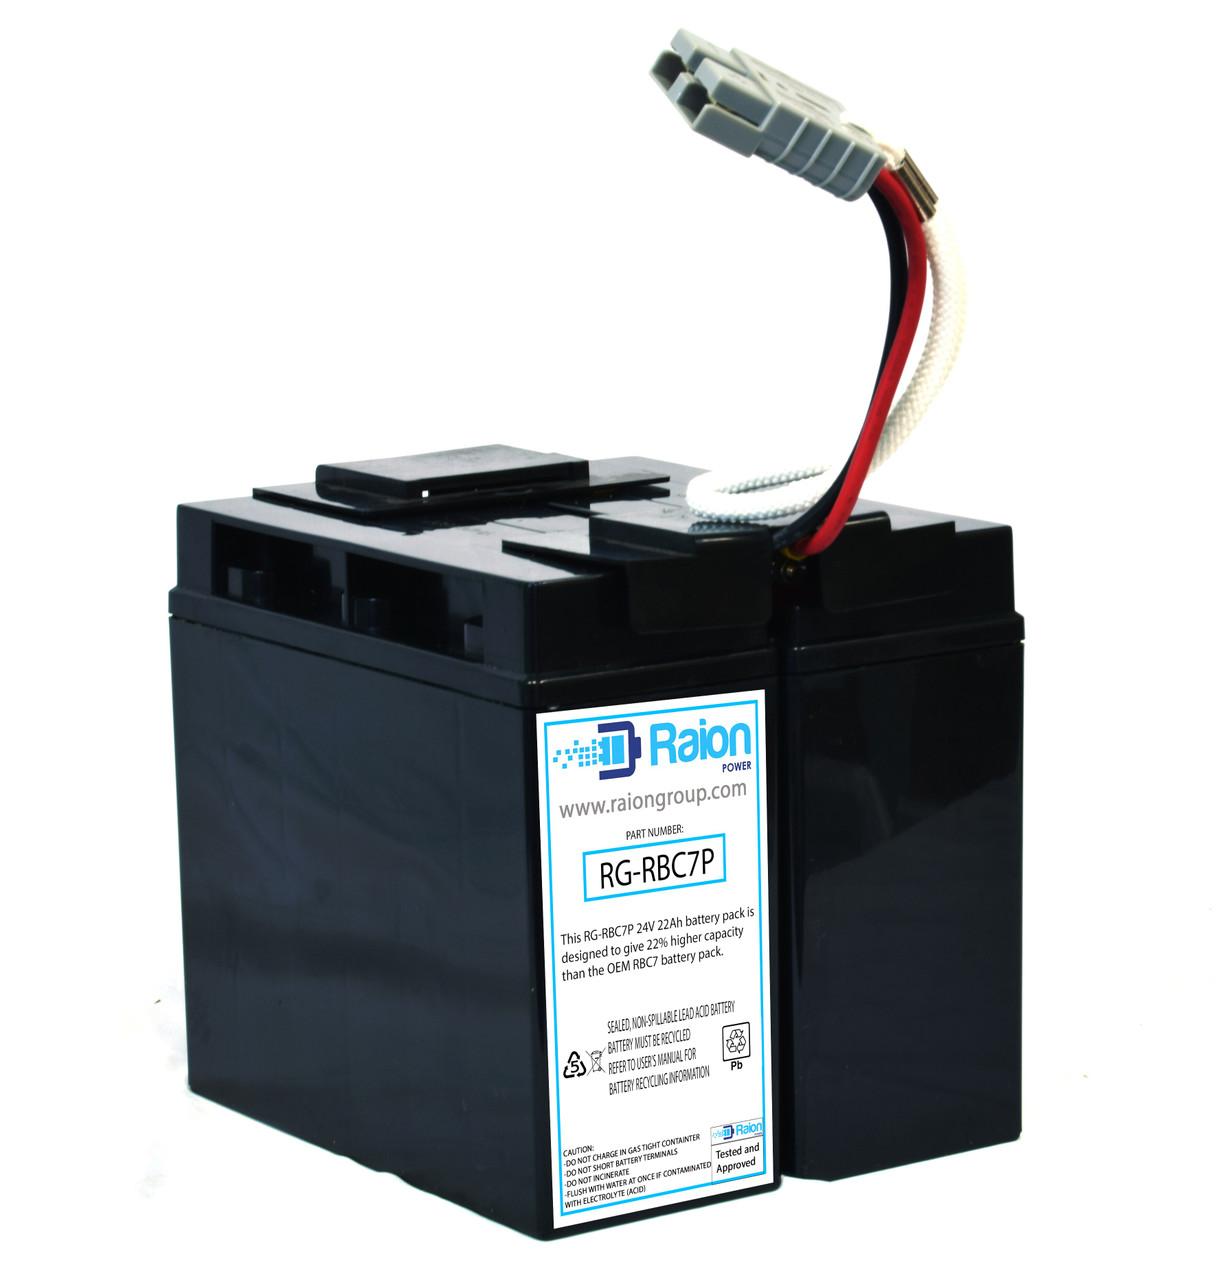 Raion Power RG-RBC7 Plus Replacement Battery Cartridge For APC SUA1500X93